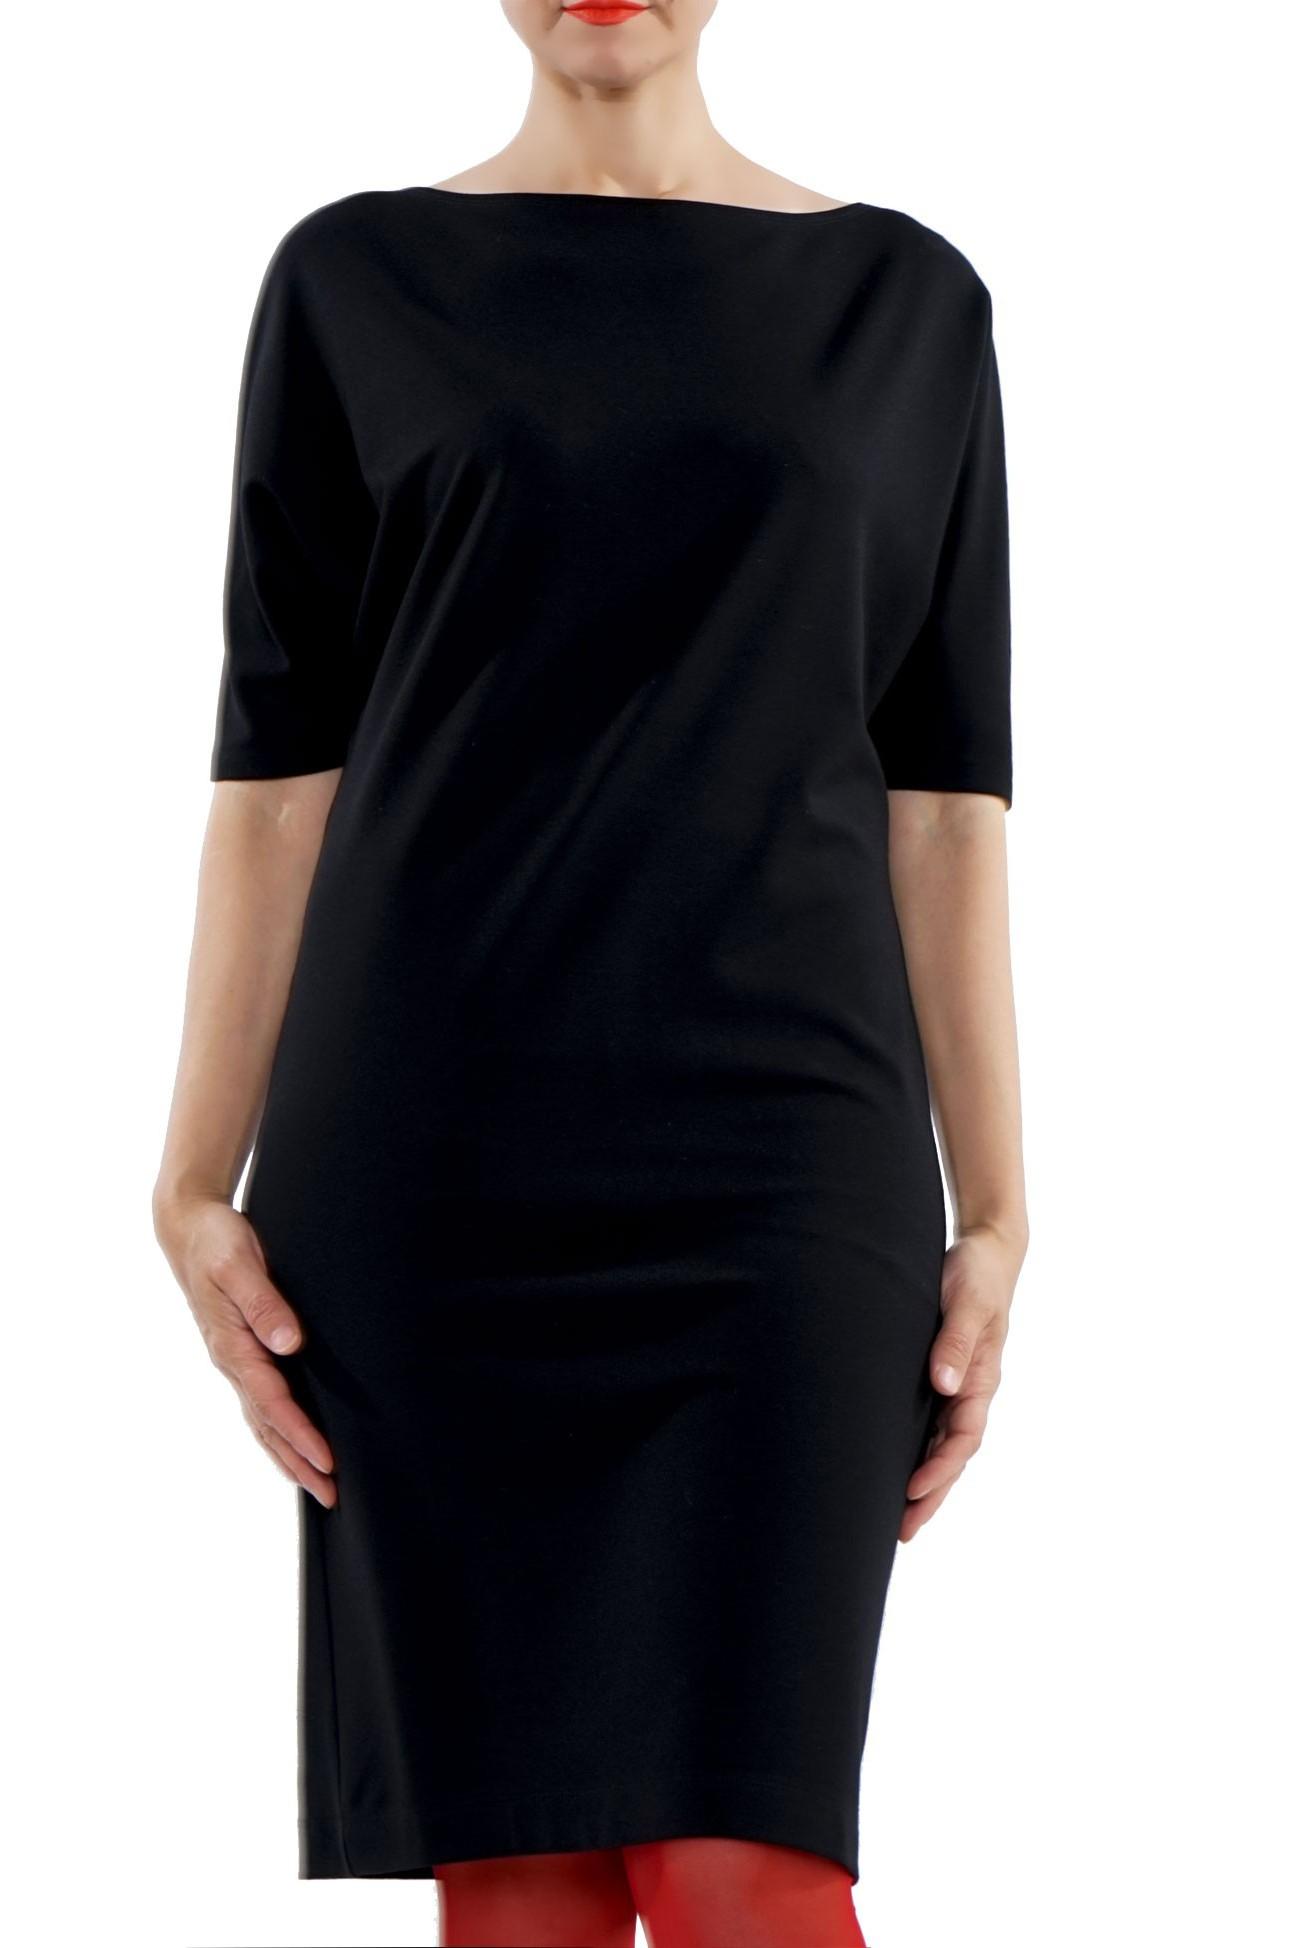 Rochie neagra cu maneca chimono